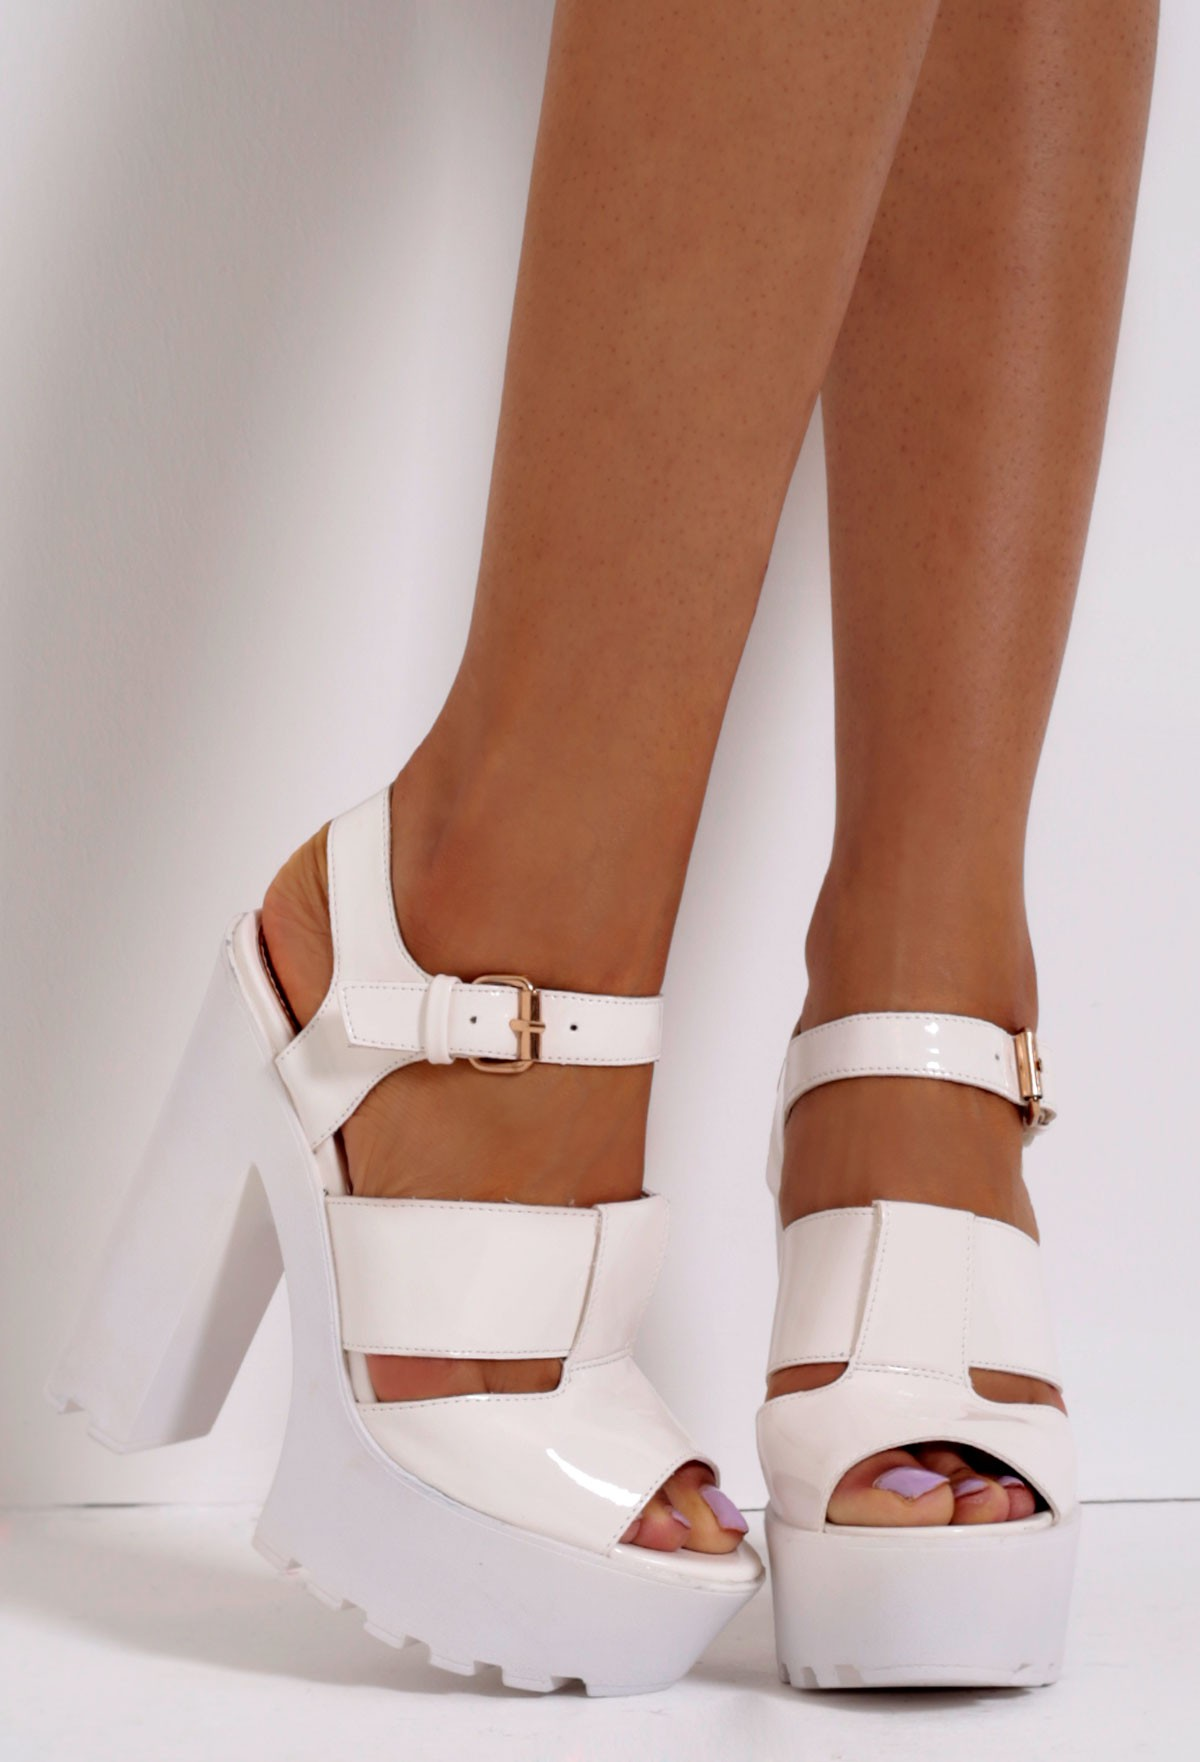 All White Platform Heels - Is Heel